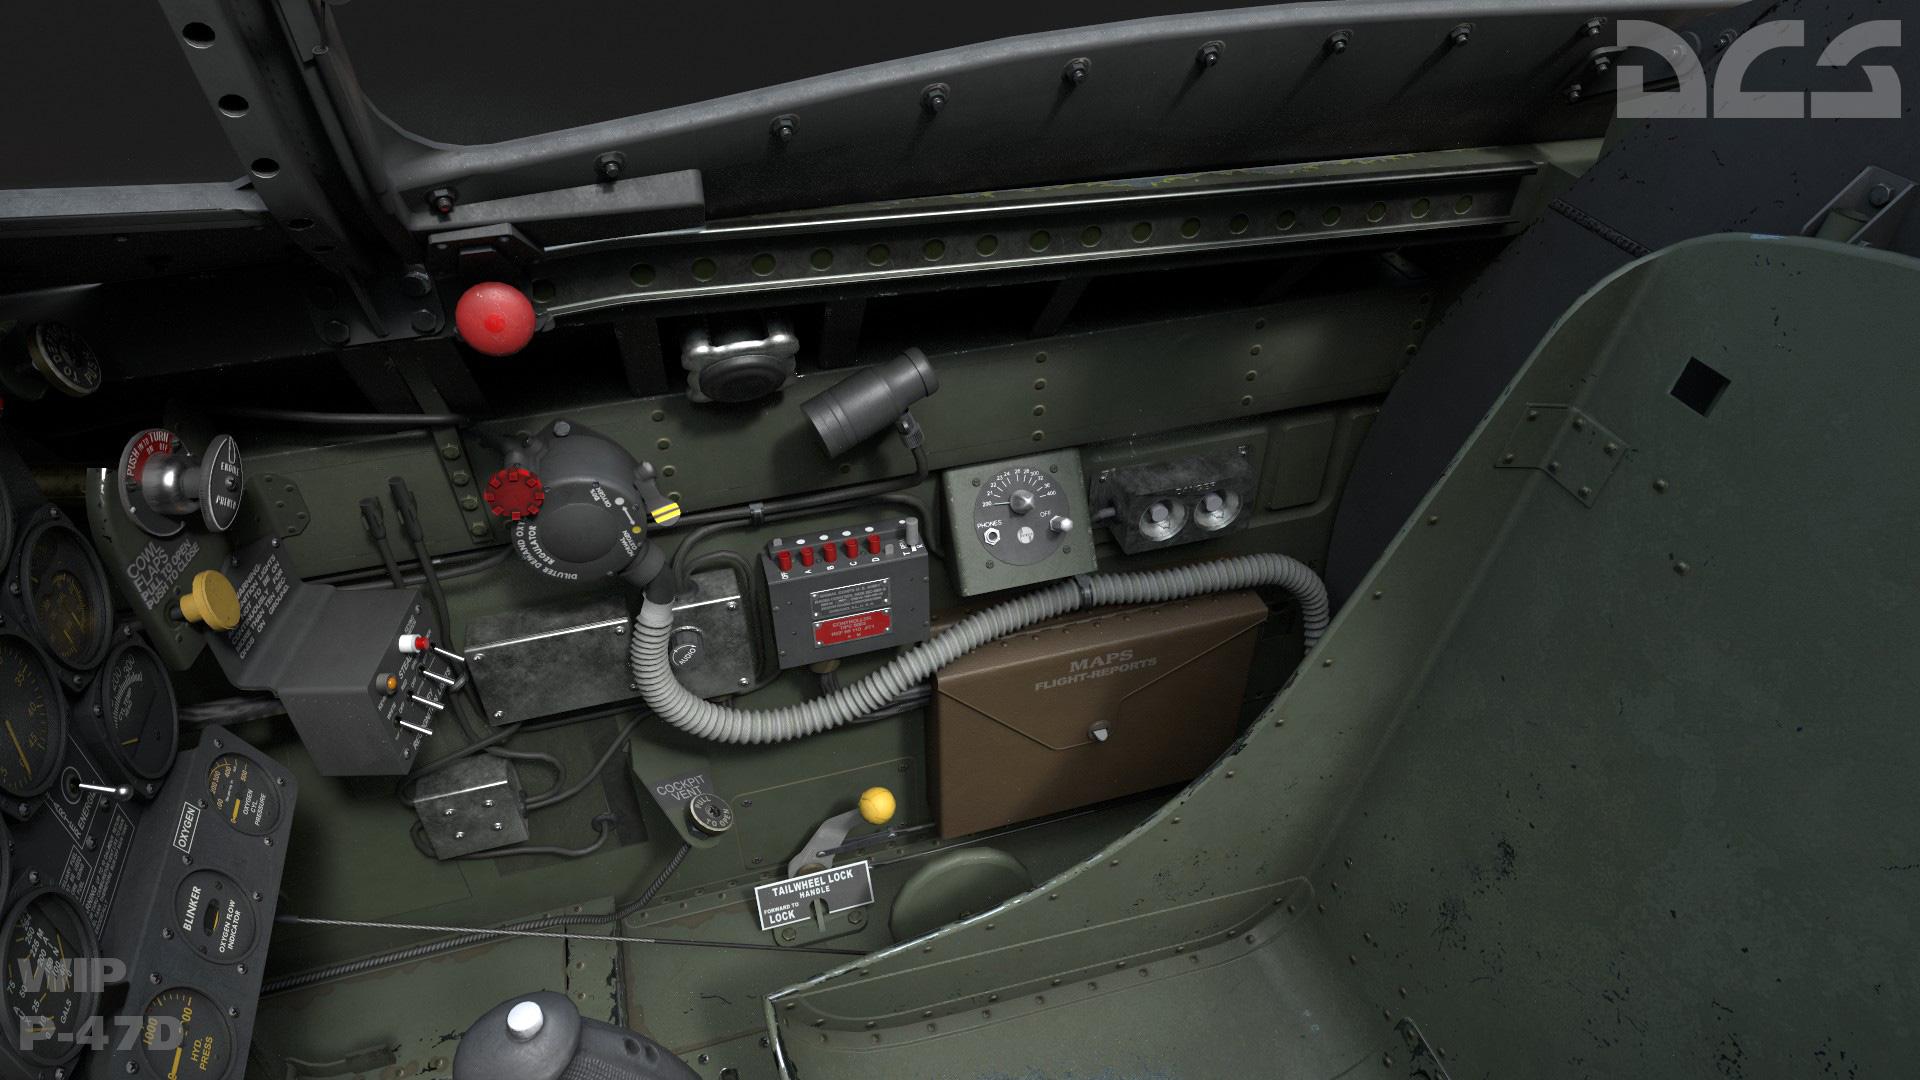 P-47D-cockpit-WIP-03.jpg